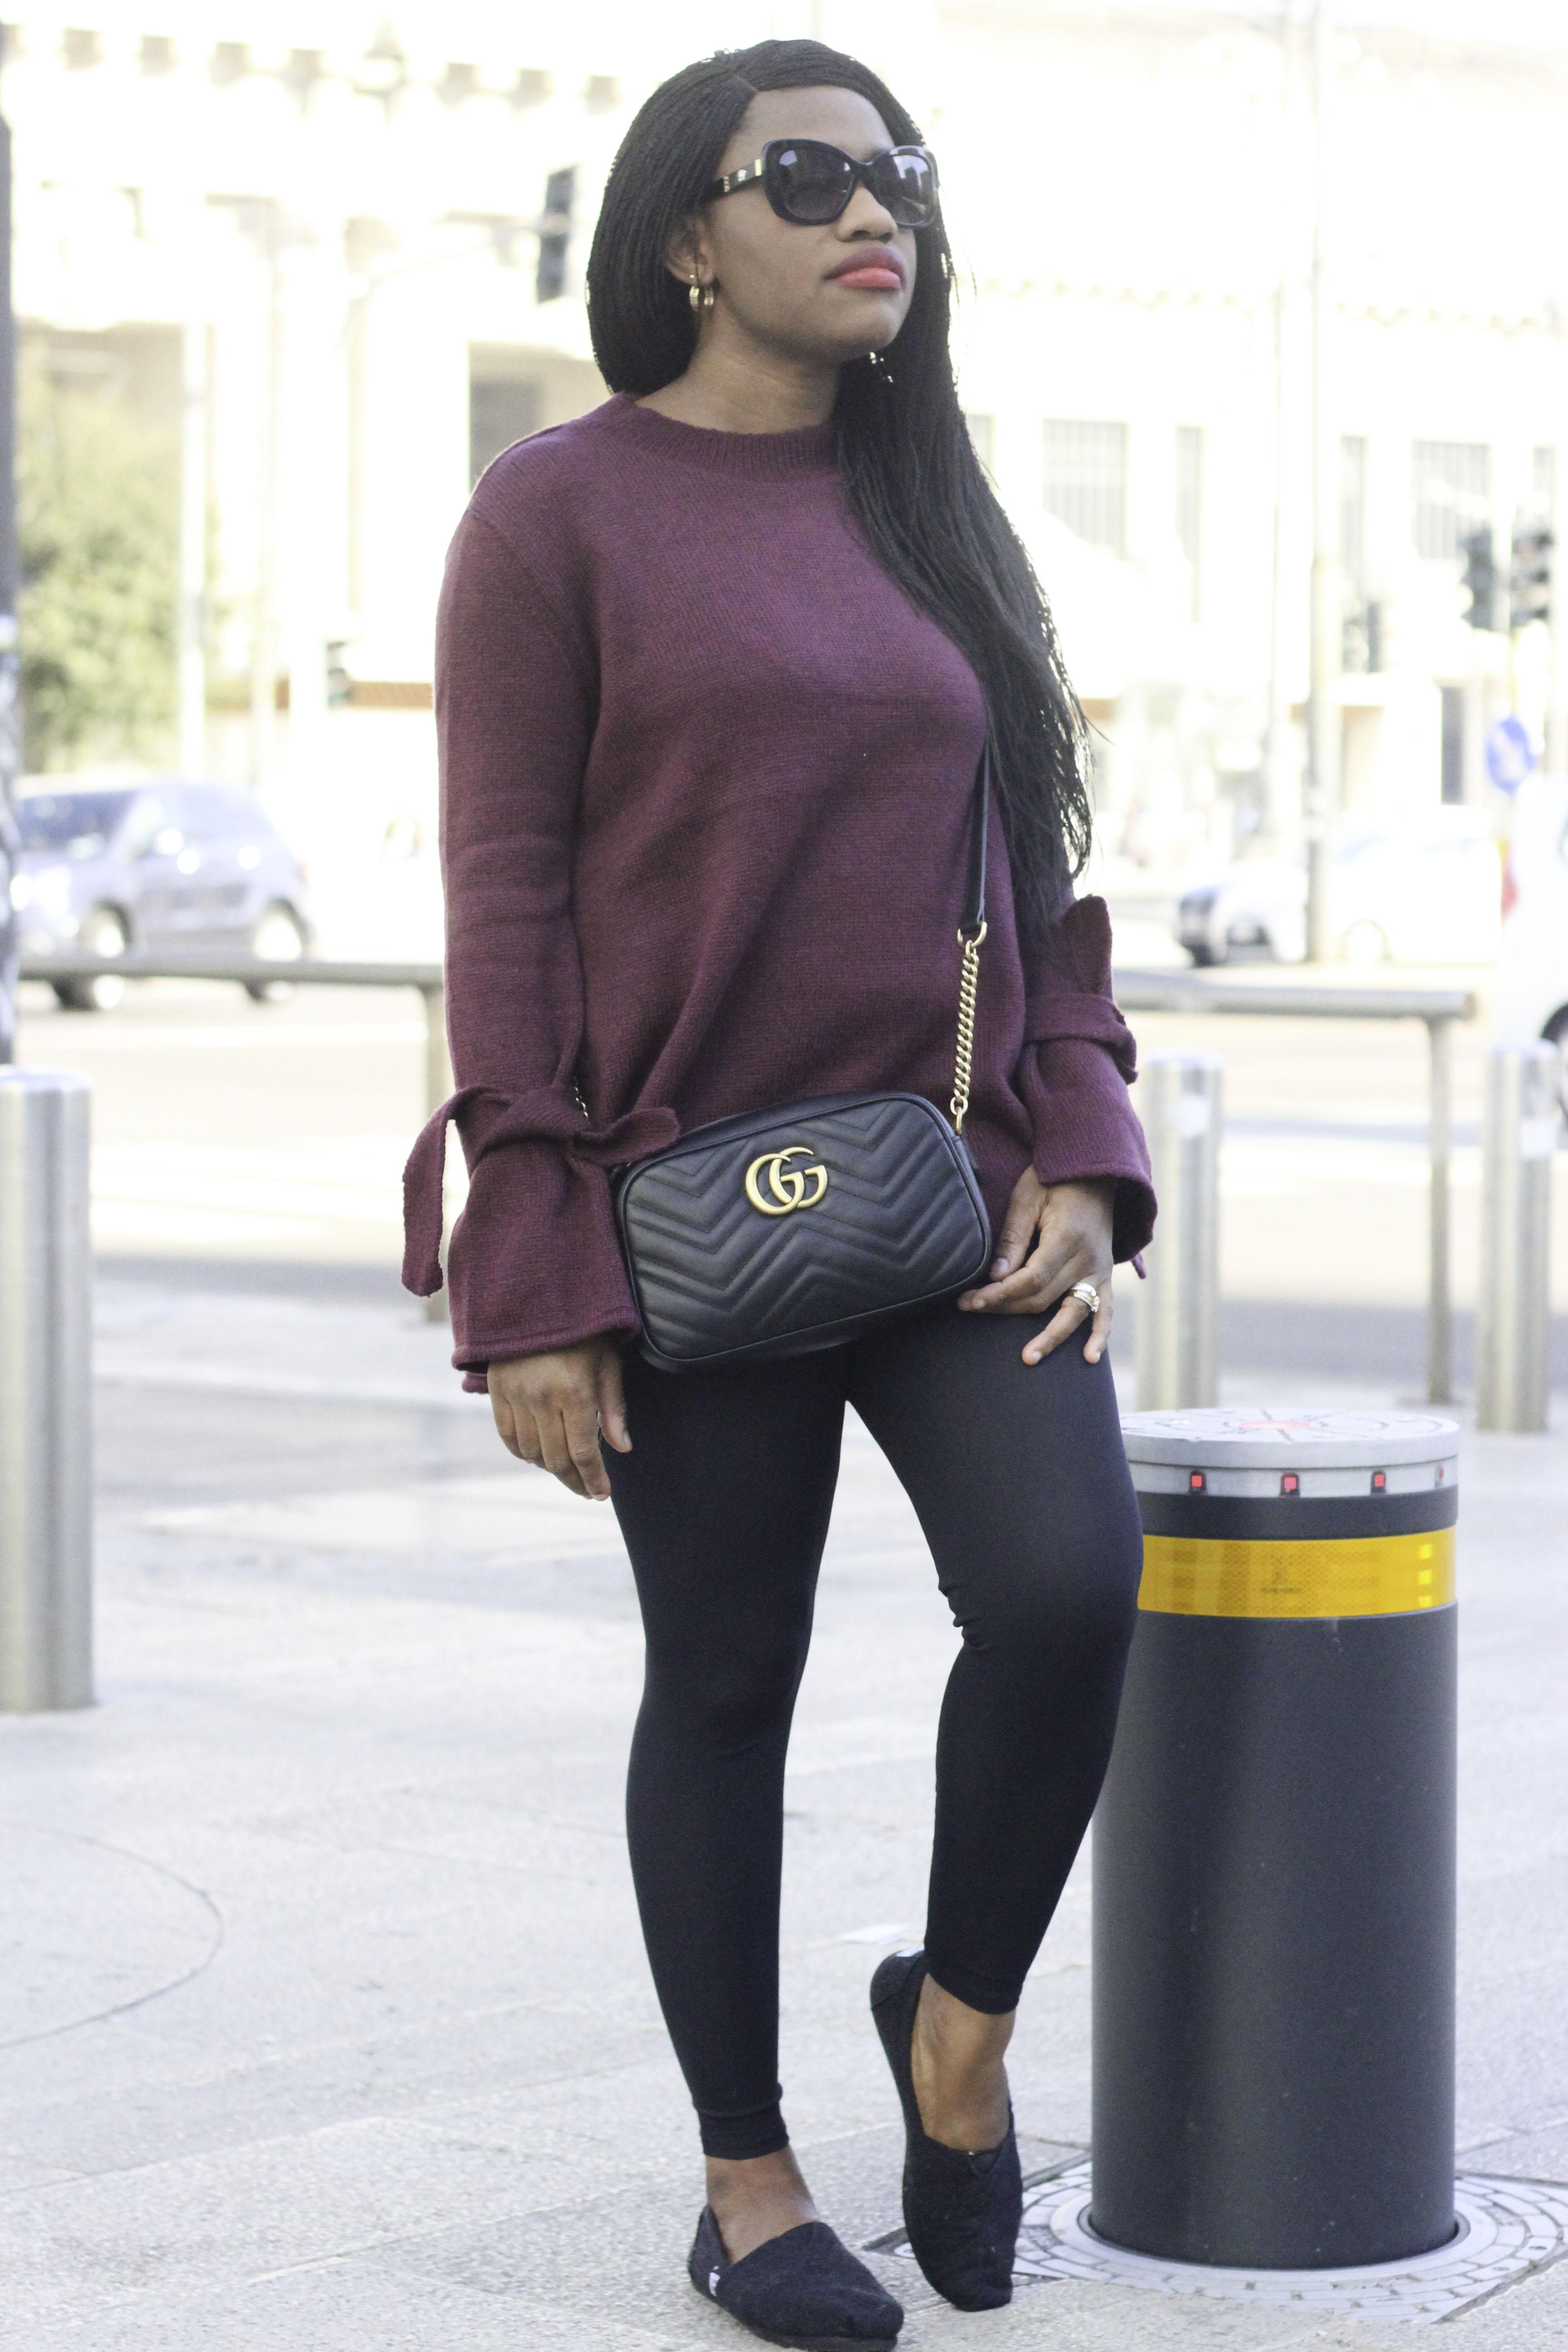 512ea3f91208 gucci-image. I got this Gucci GG Marmont Matelasse shoulder bag ...